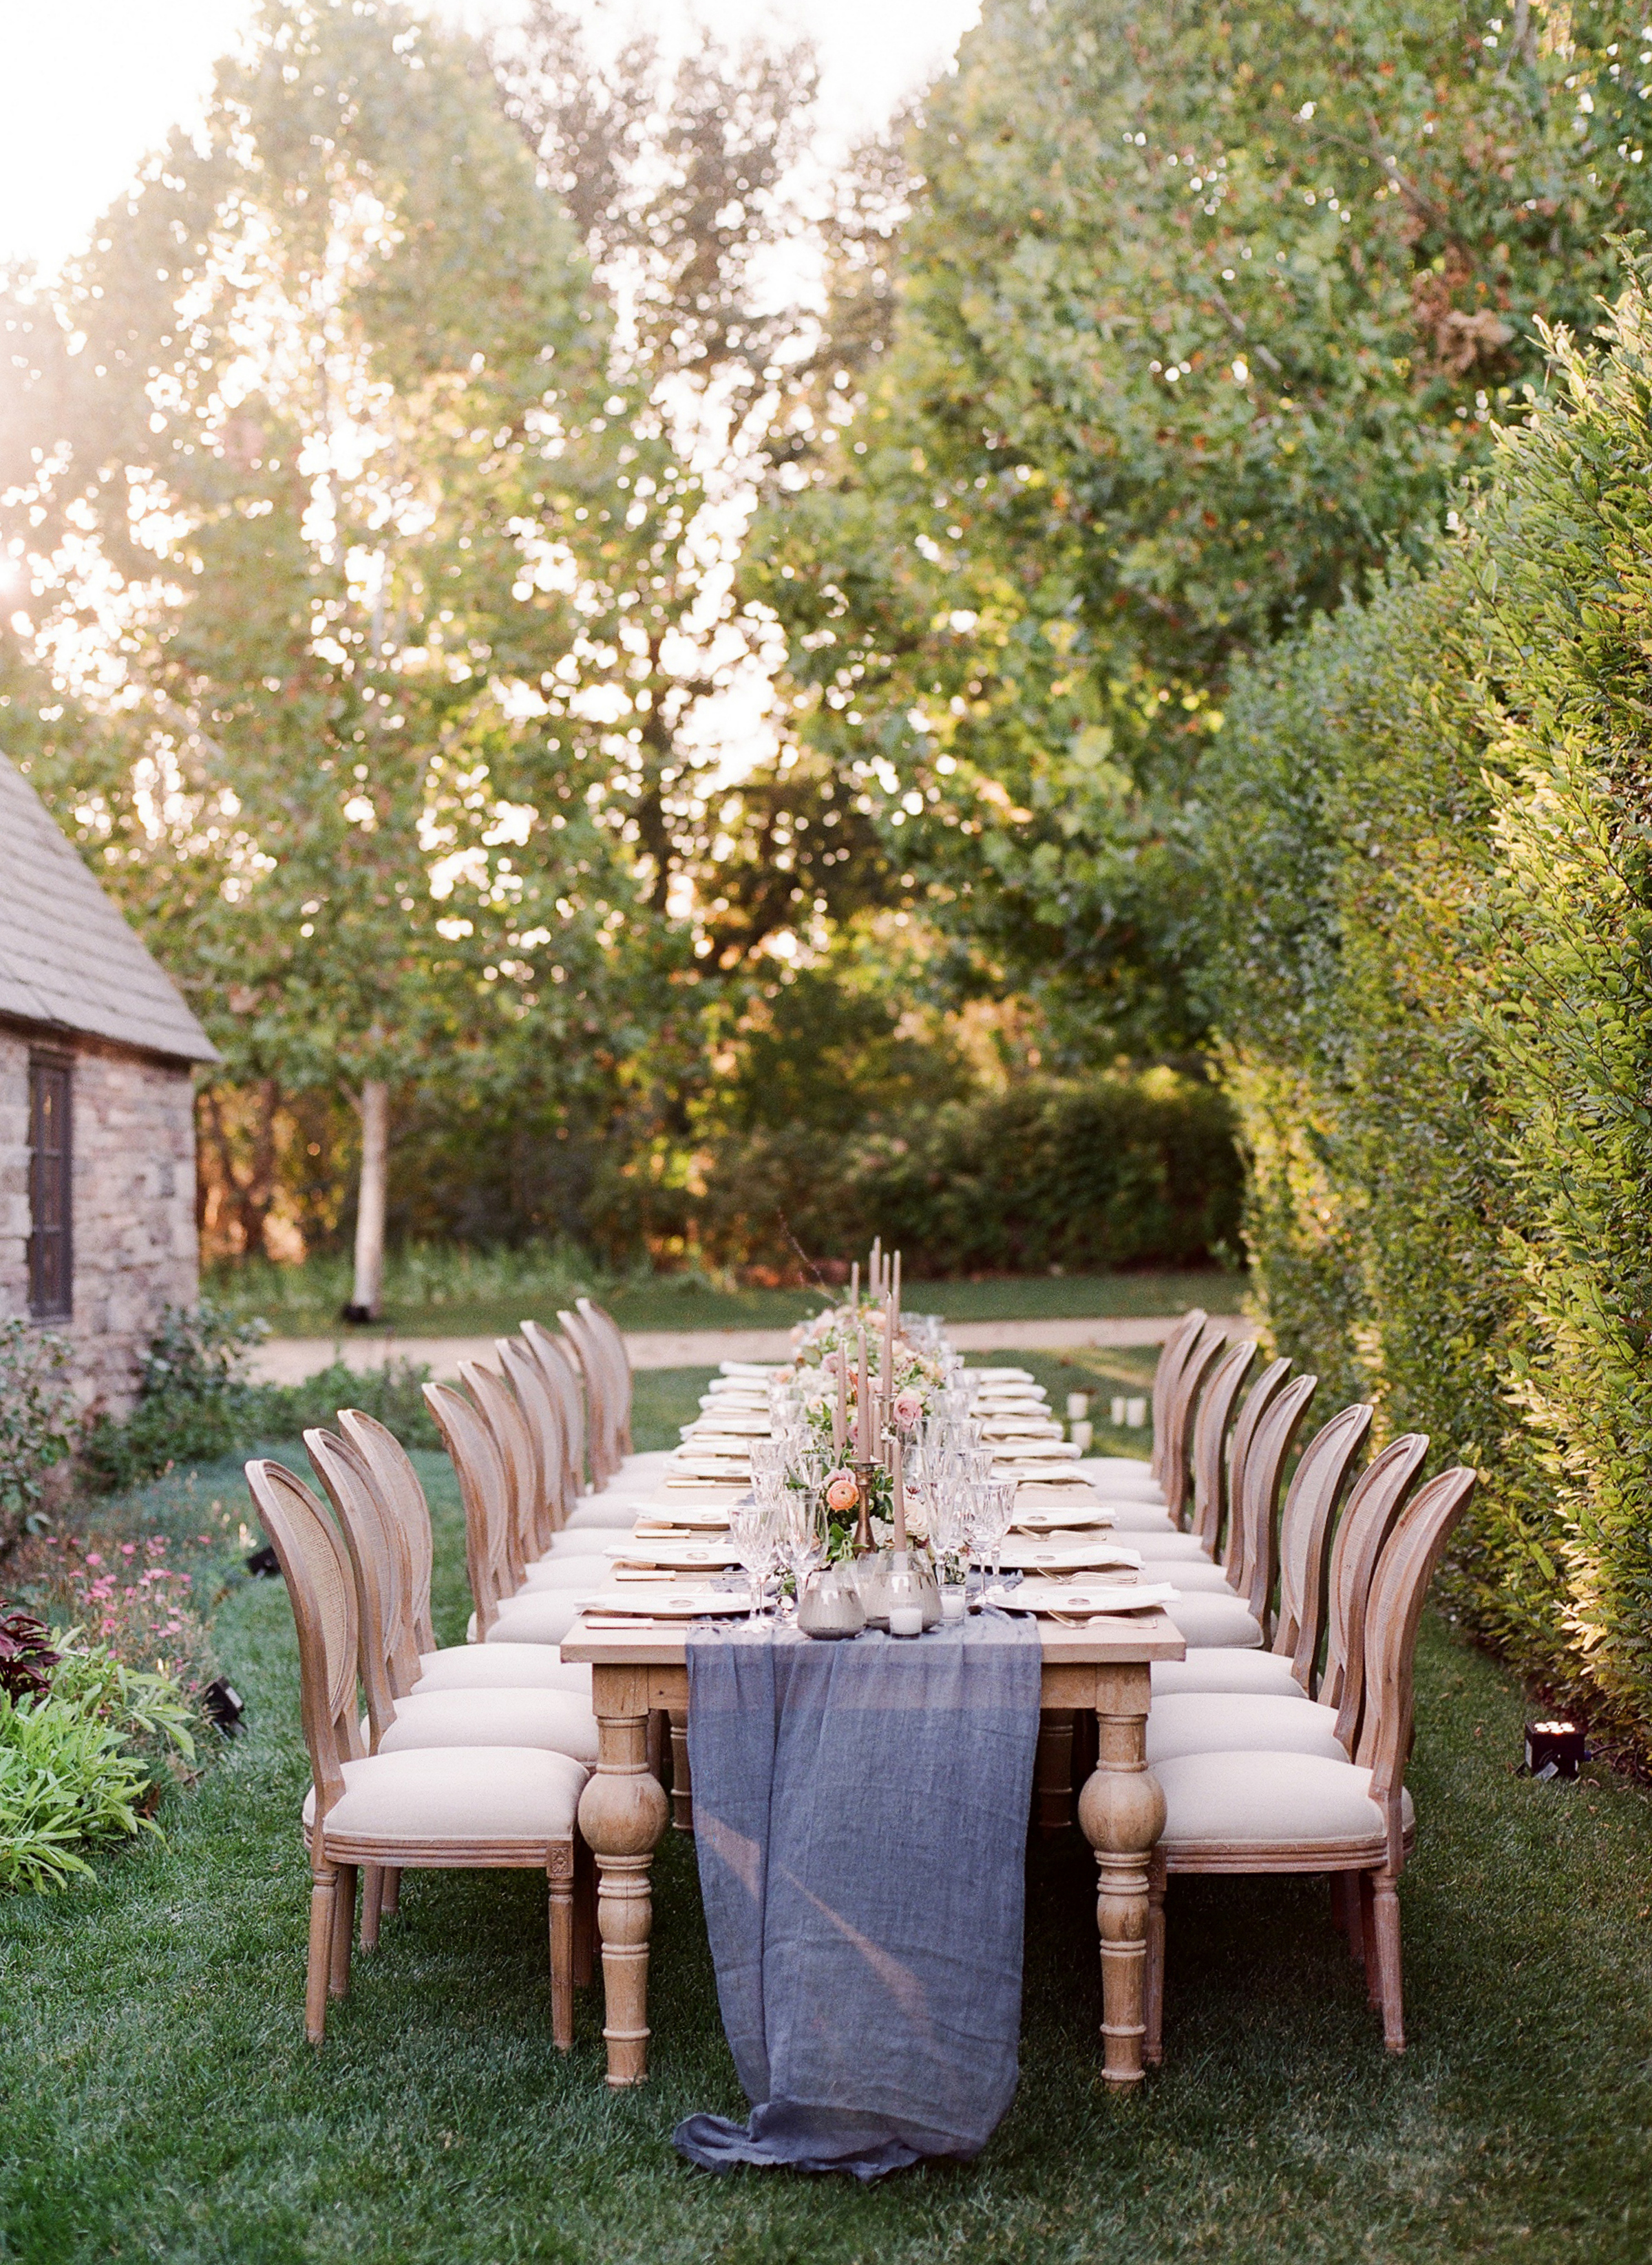 santa-barbara-elopement-elope-wedding-planner-planning-coordinator-day-of-intimate-event-design-kestrel-park-santa-ynez-english-country-estate-garden-castle (22).jpg